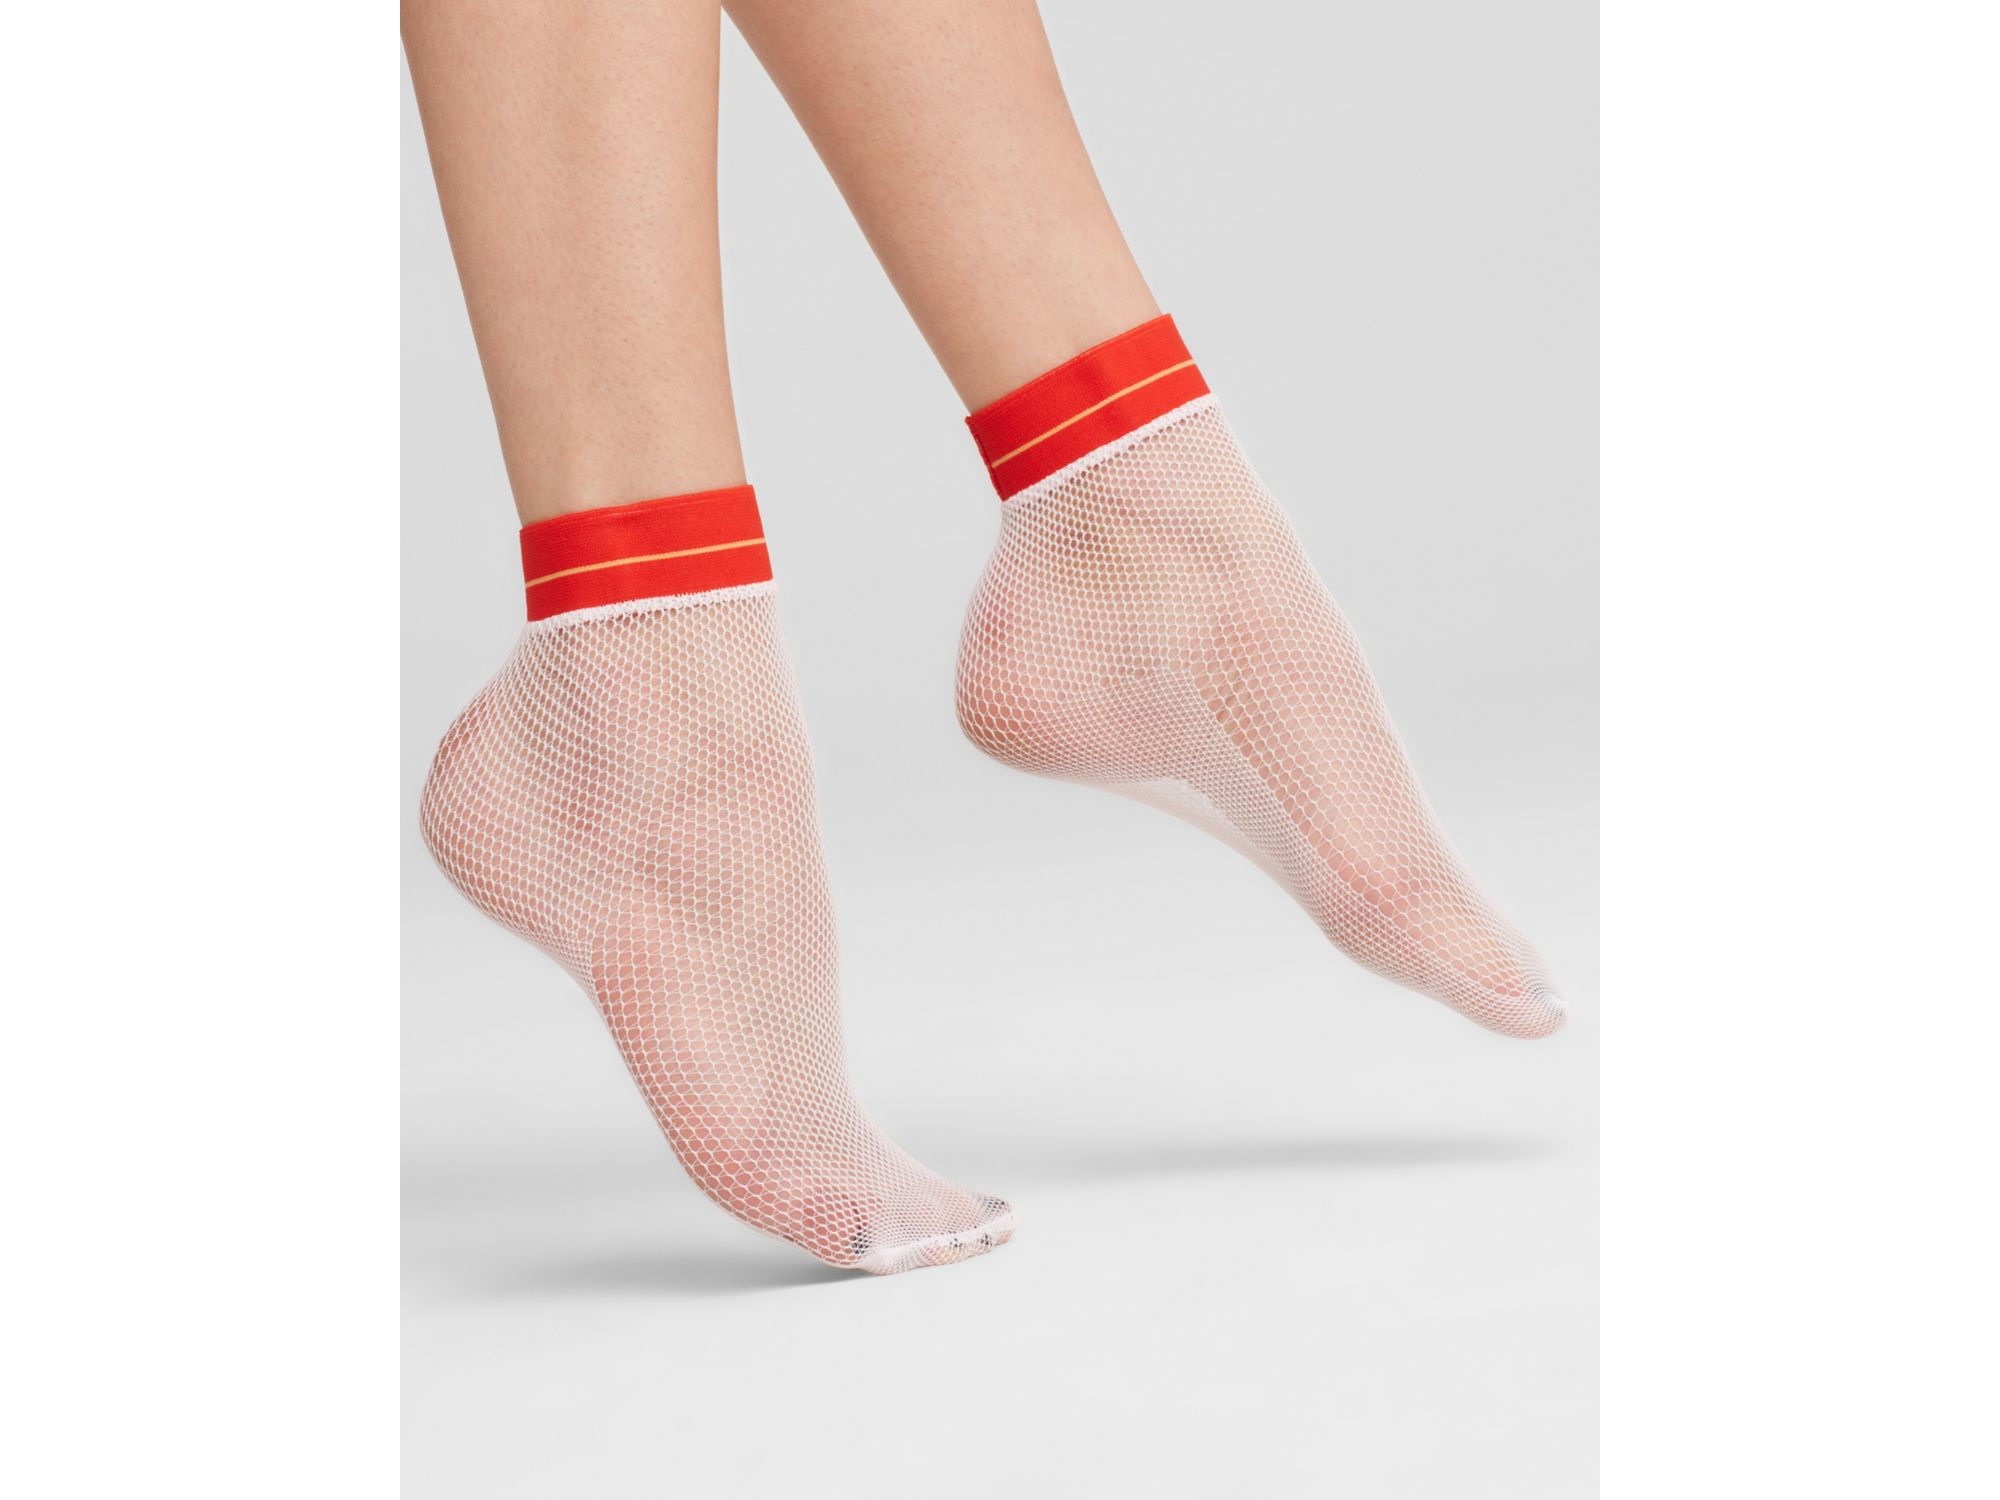 Hosiery Socks Hue Socks Basketweave Turncuff Socks Choose Your Color U16597 Clothing Shoes Accessories Vishawatch Com